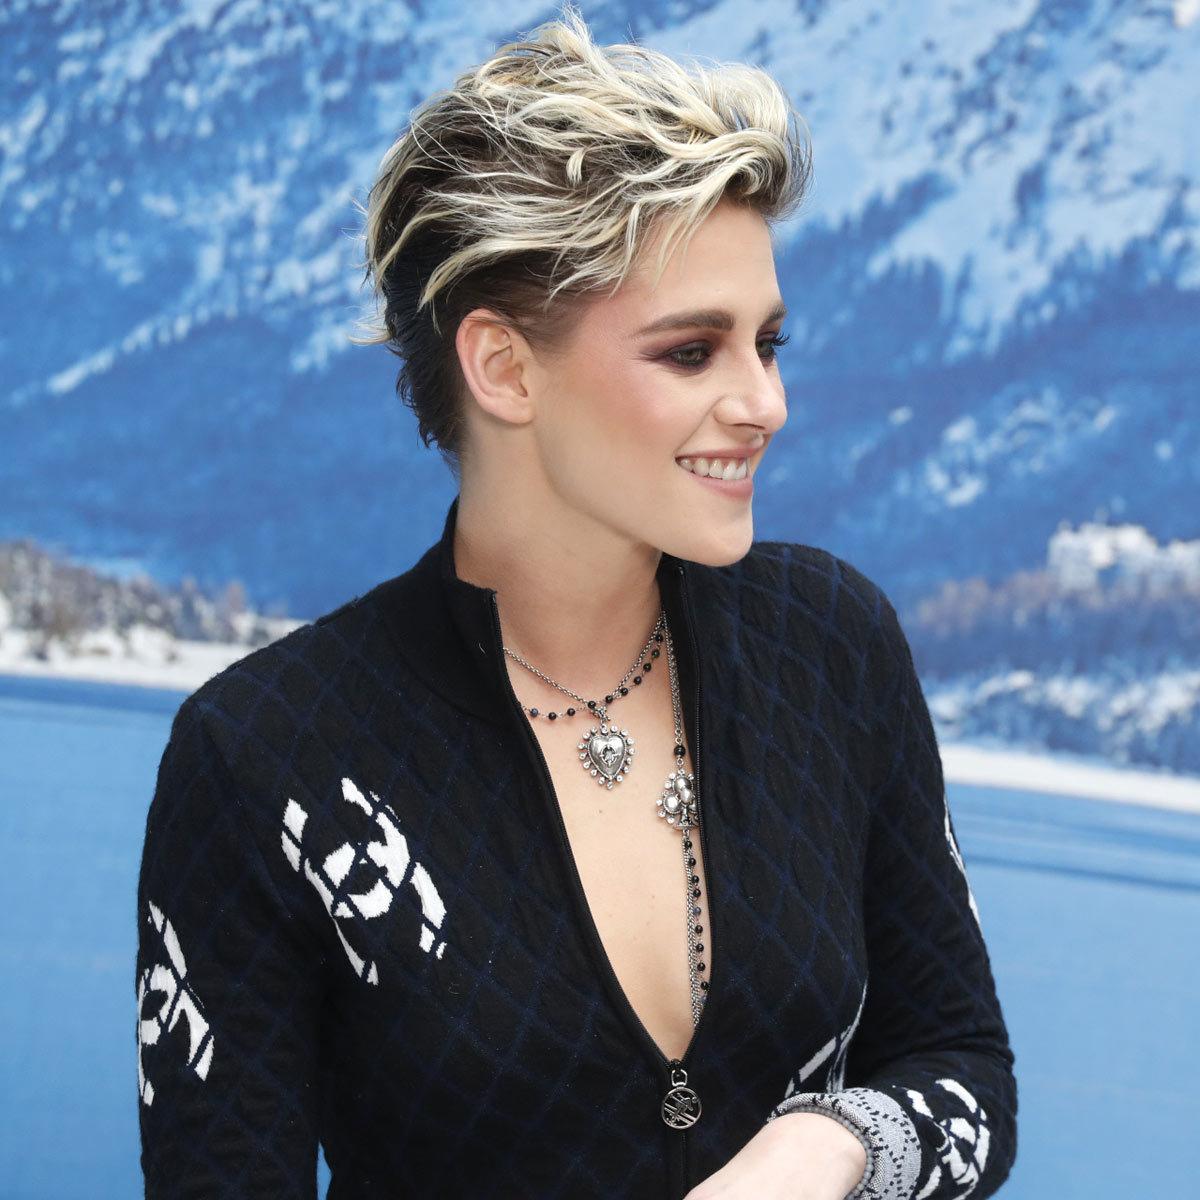 Kristen Stewart presume de corte pixie texturizado, ligeramente más...